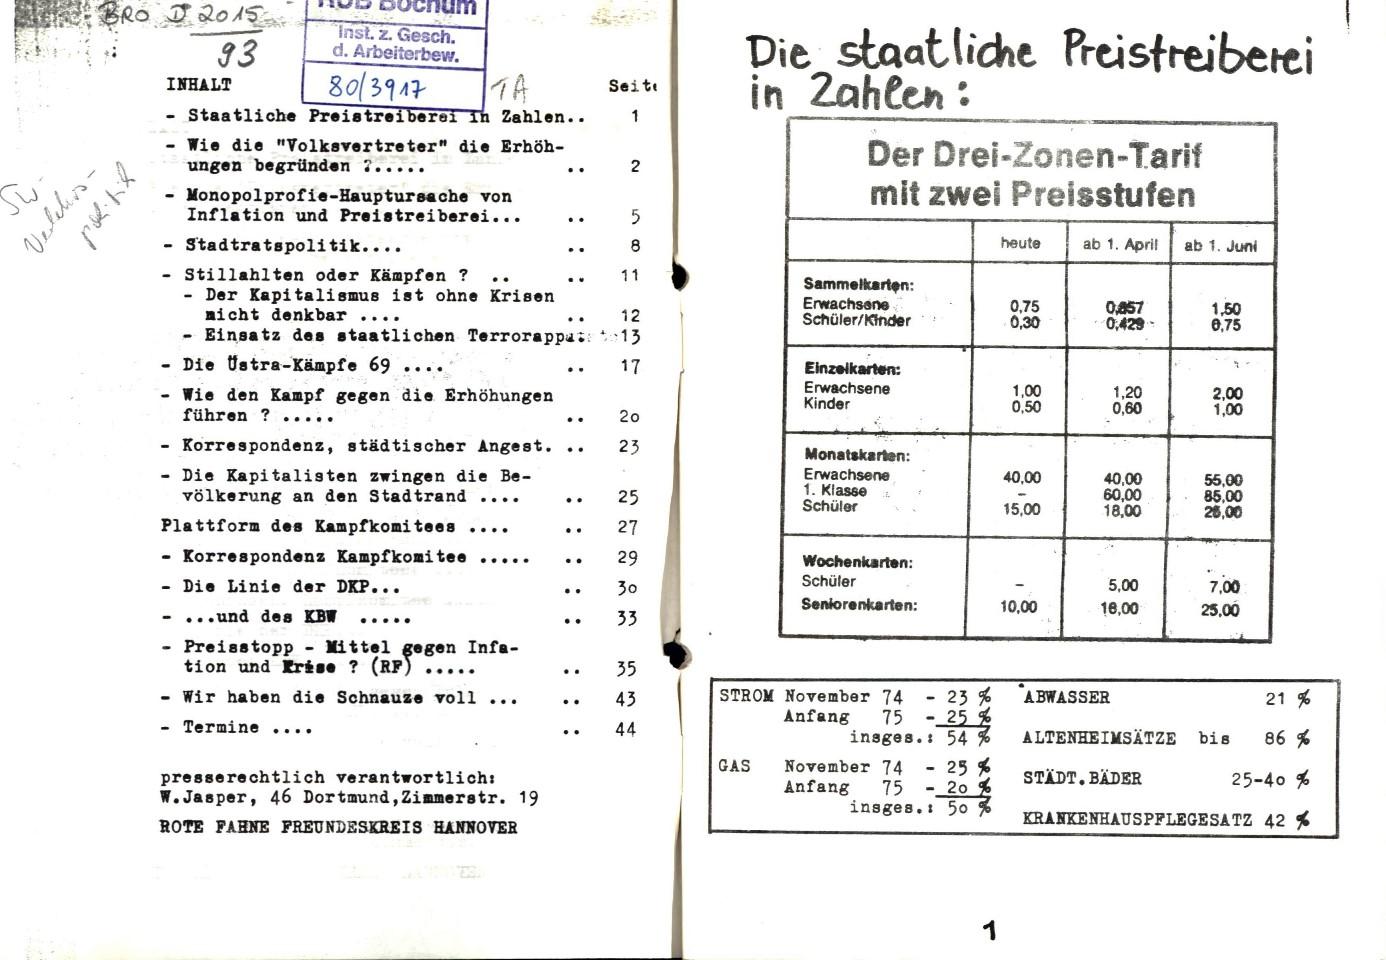 Hannover_AO_1975_Fahrpreisboykott_02